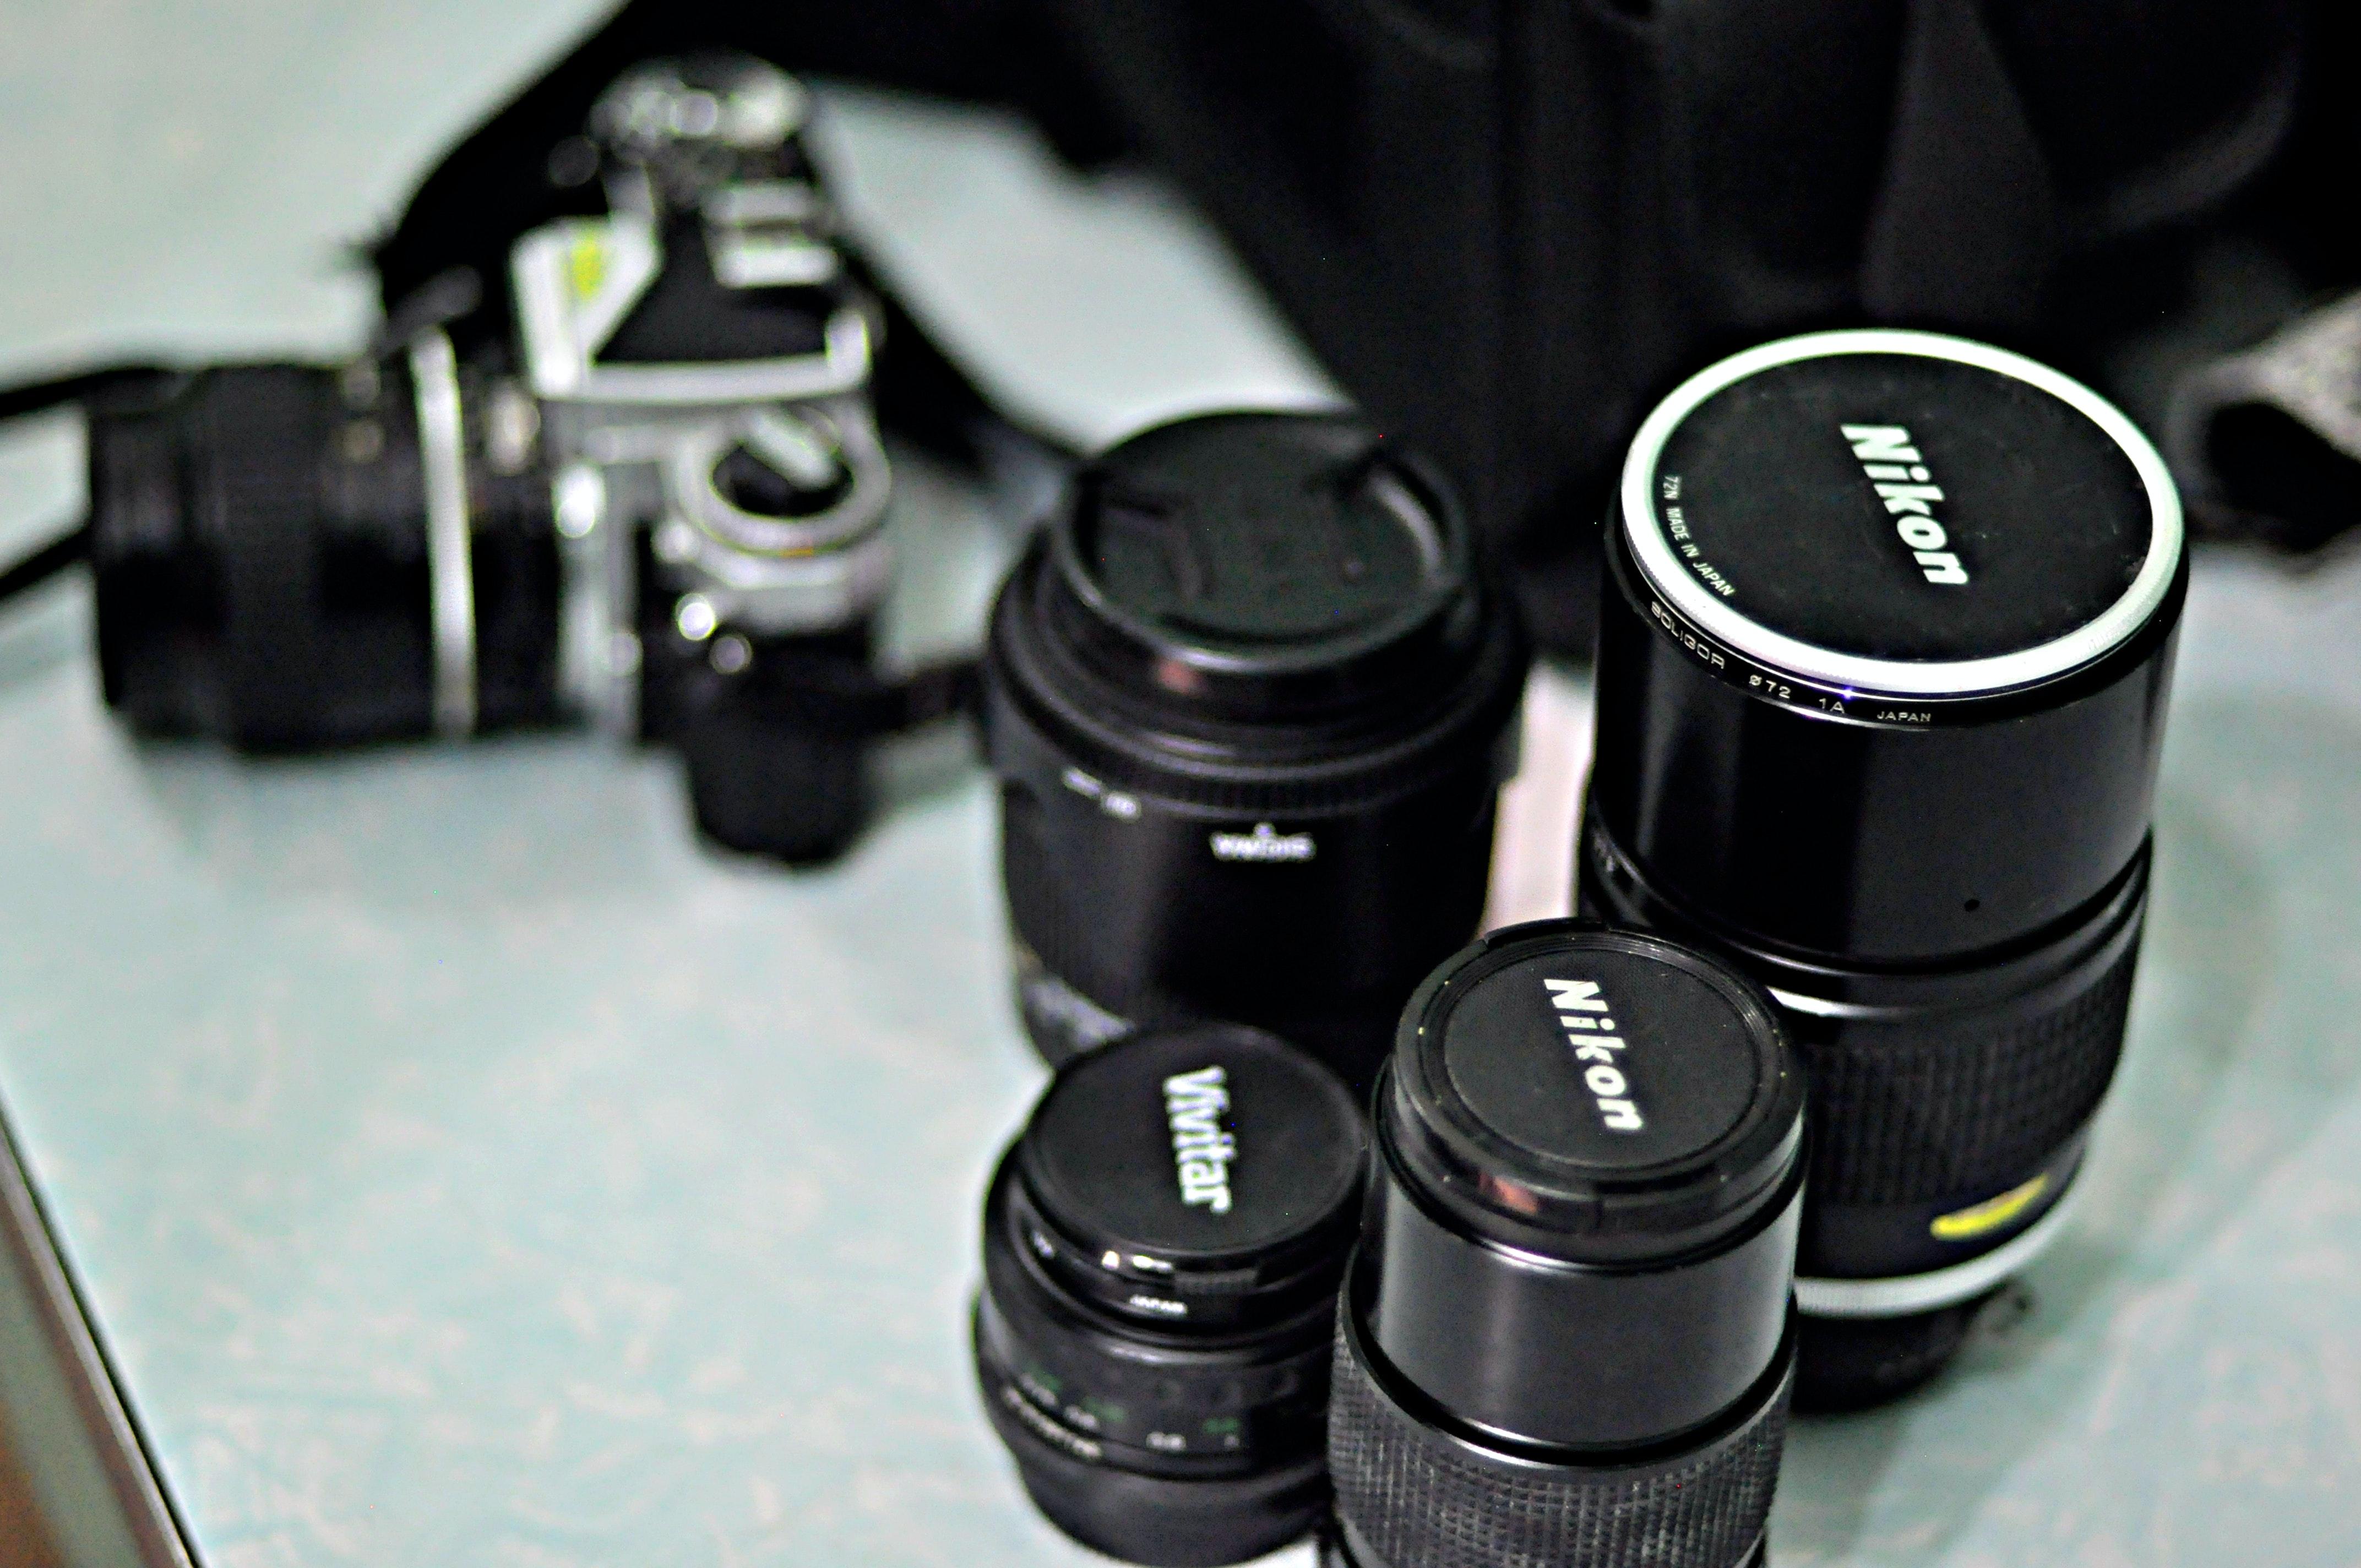 Balck Zoom Camera Lens